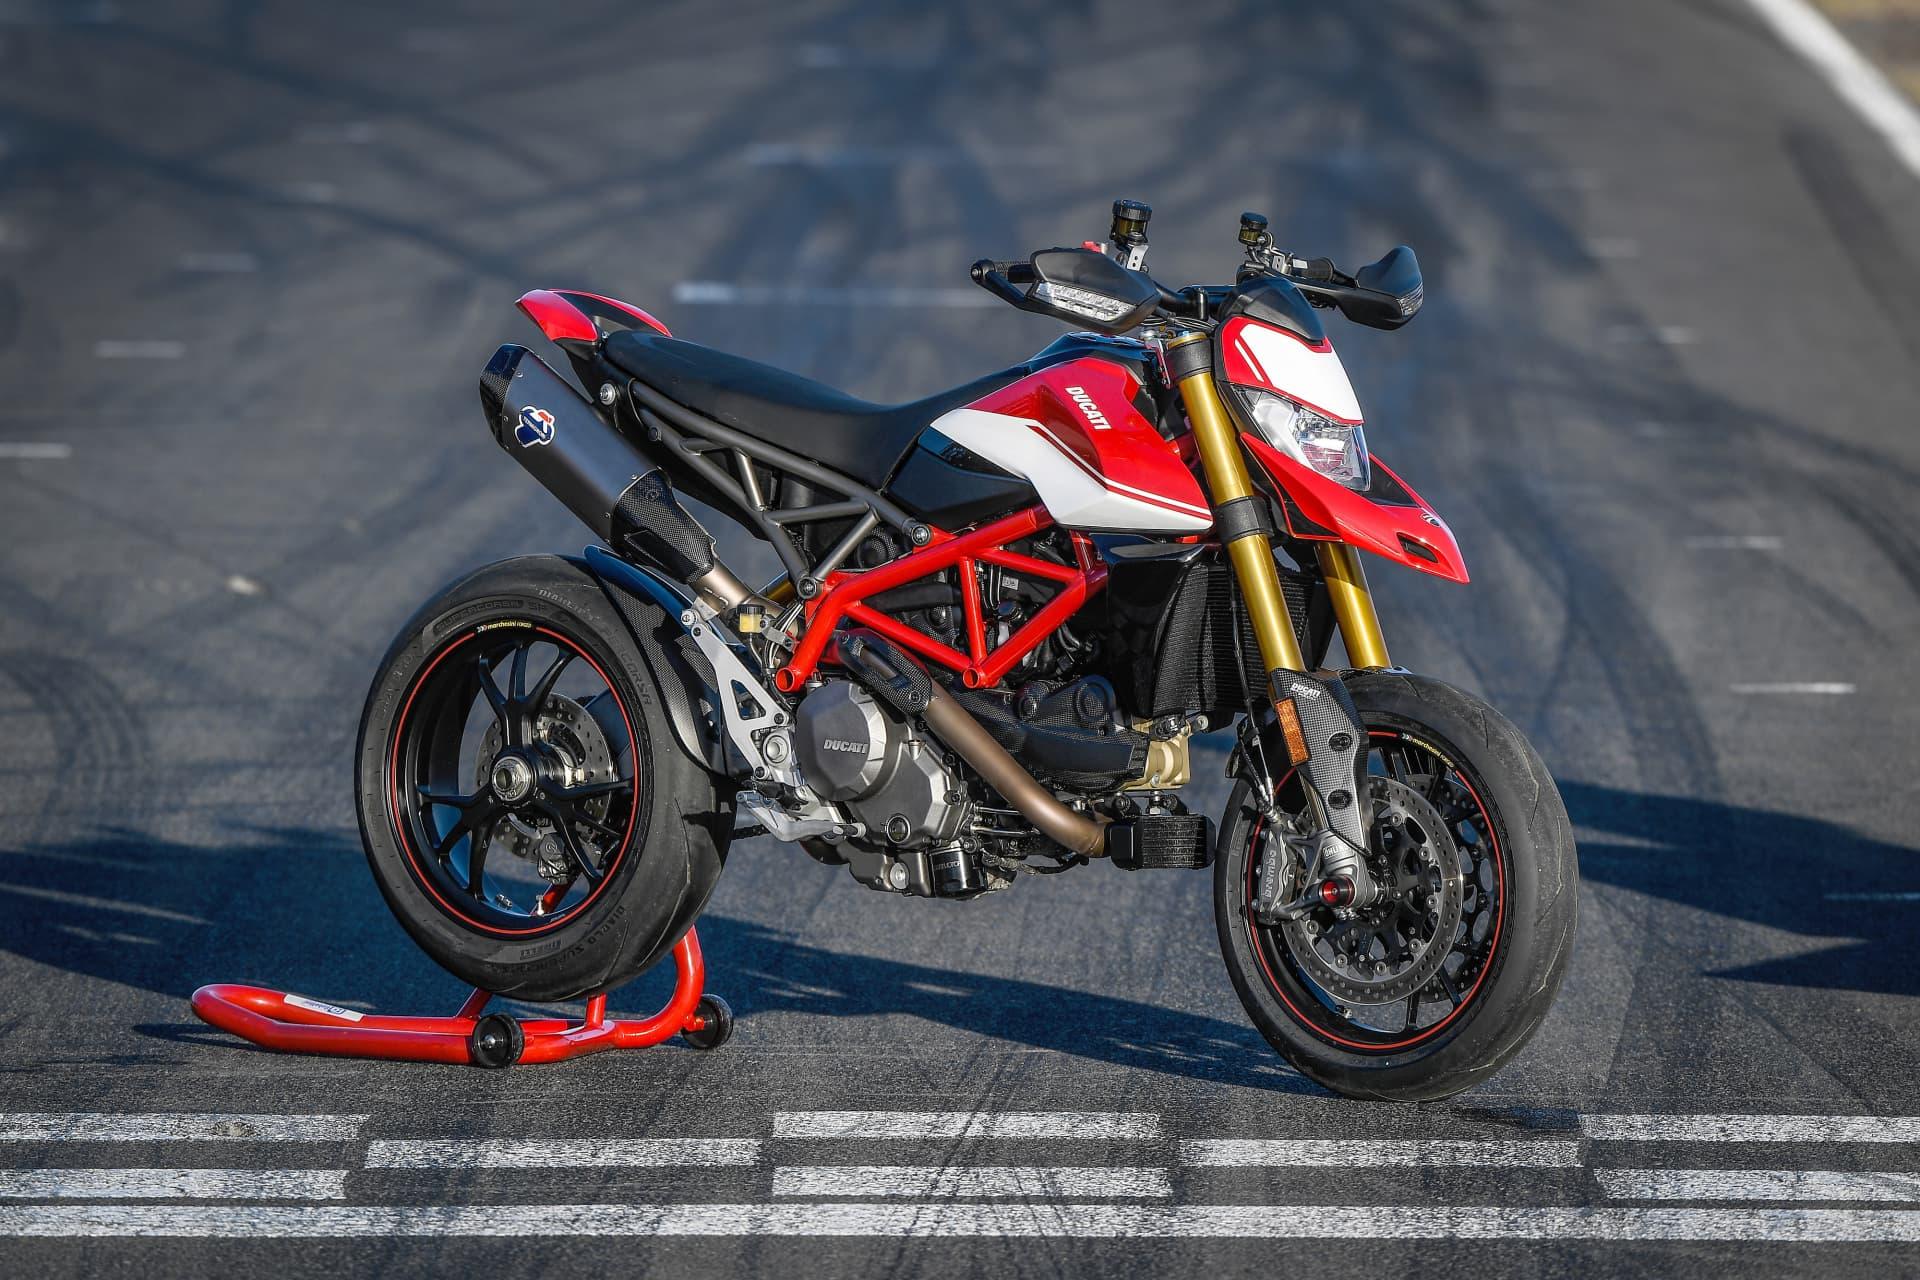 Ducati Hypermotard 950 Sp Static 17 Uc70317 Mid